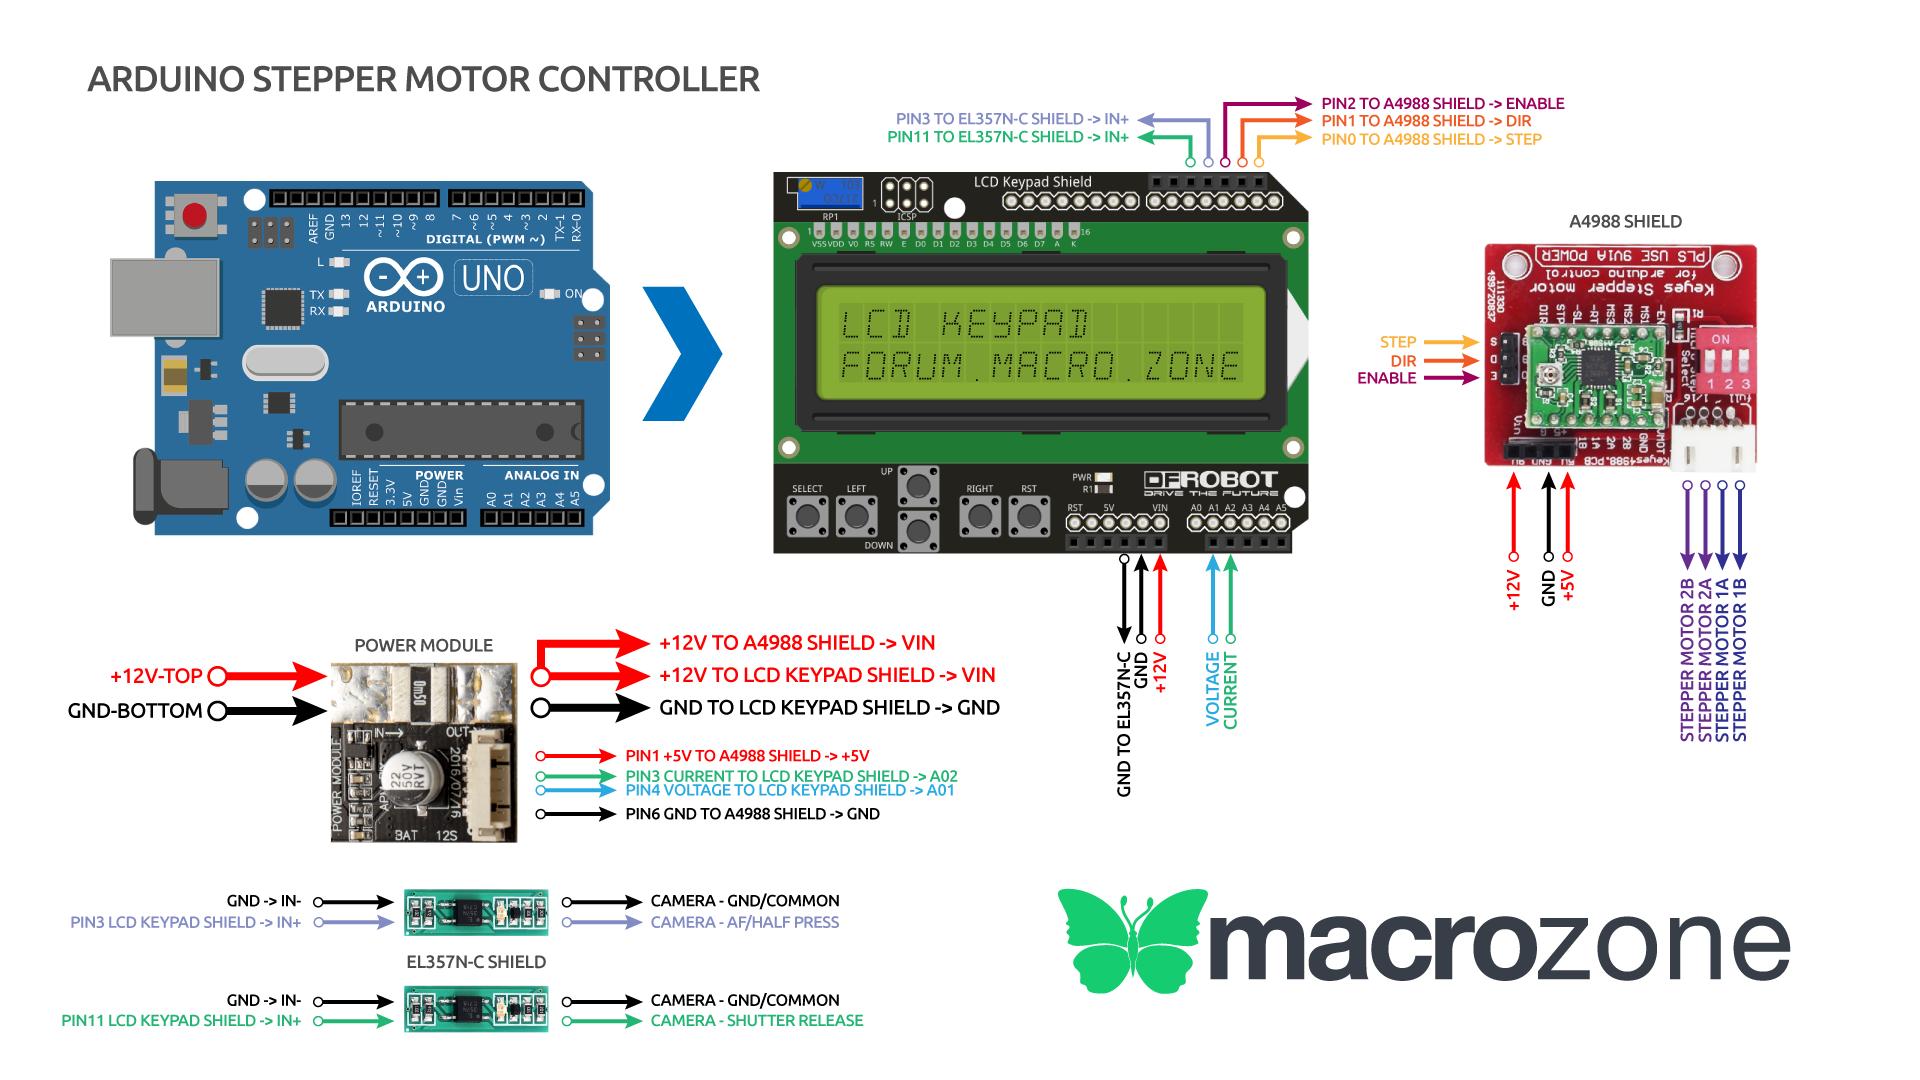 [Obrazek: Arduino_Stepper_Motor_Controller_01.png]